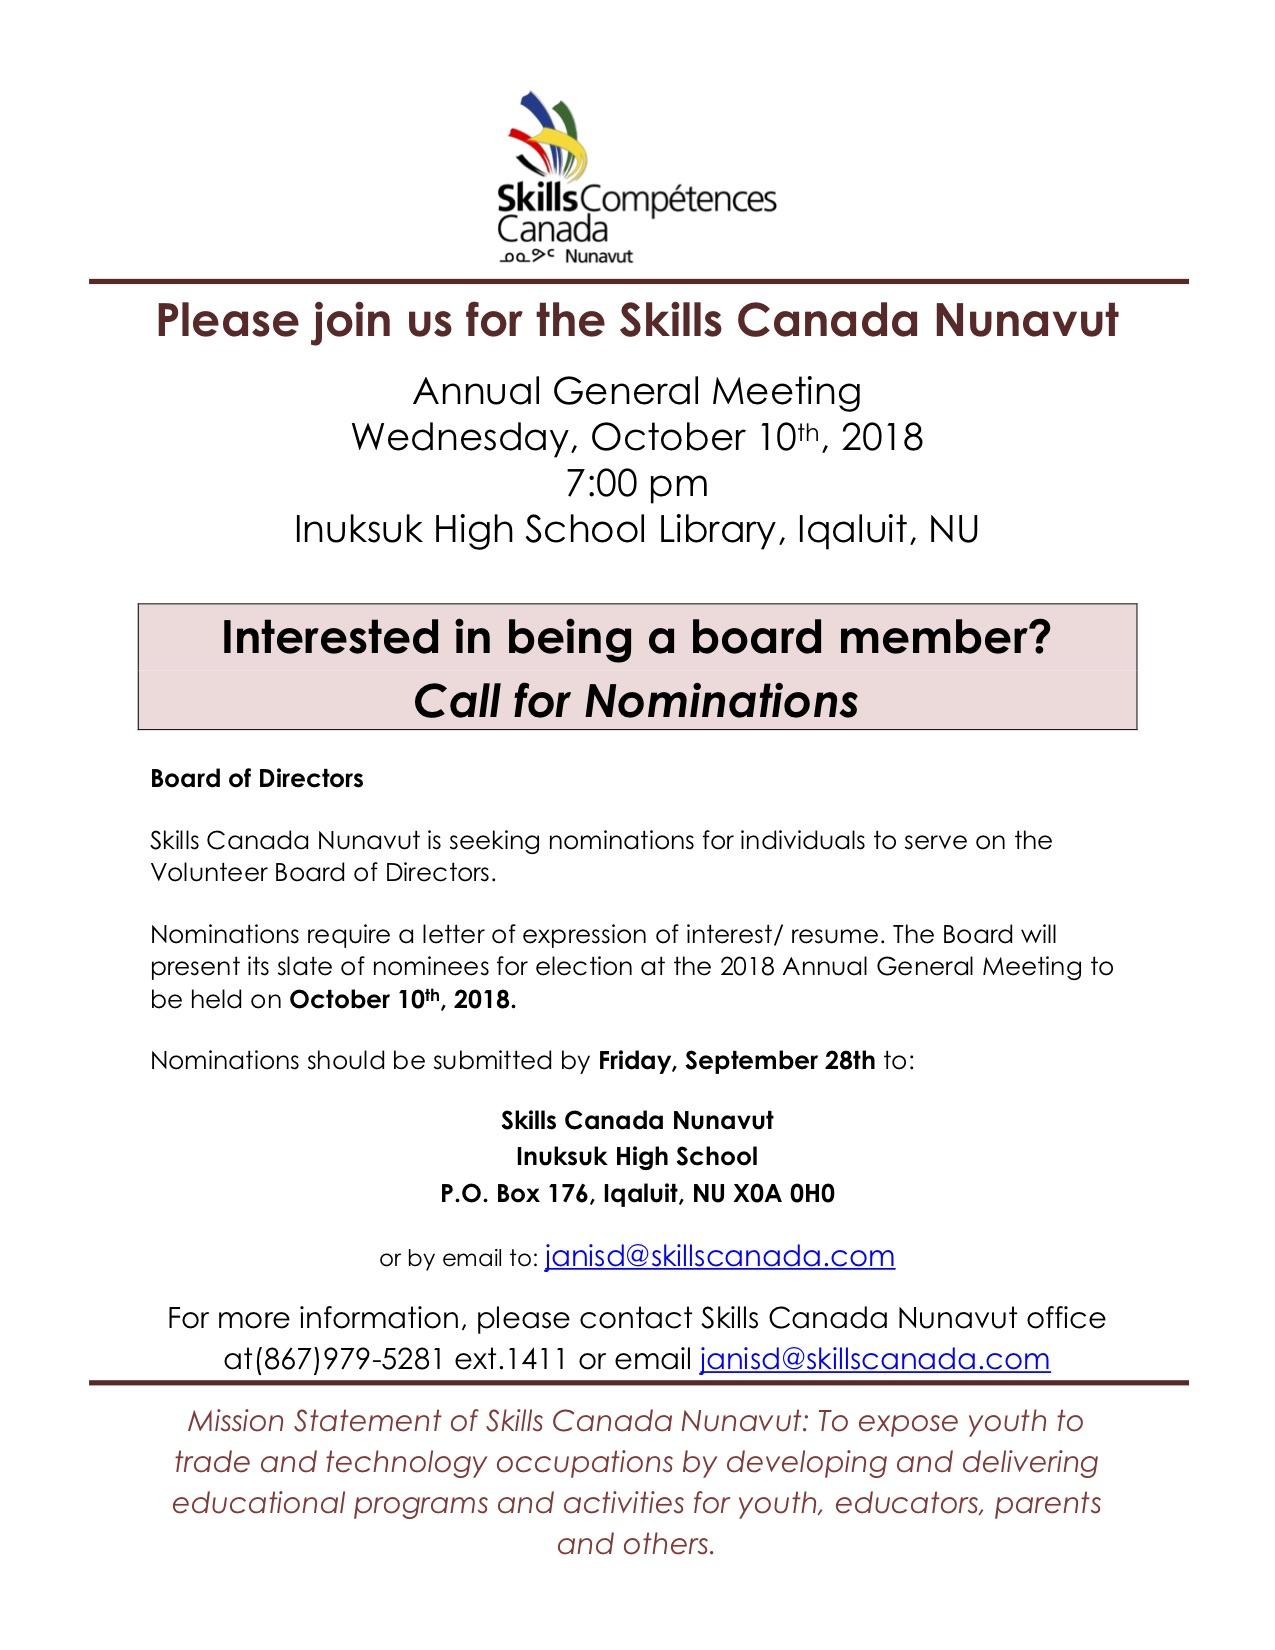 Skills Canada Nunavut AGM poster 2018 copy.jpg